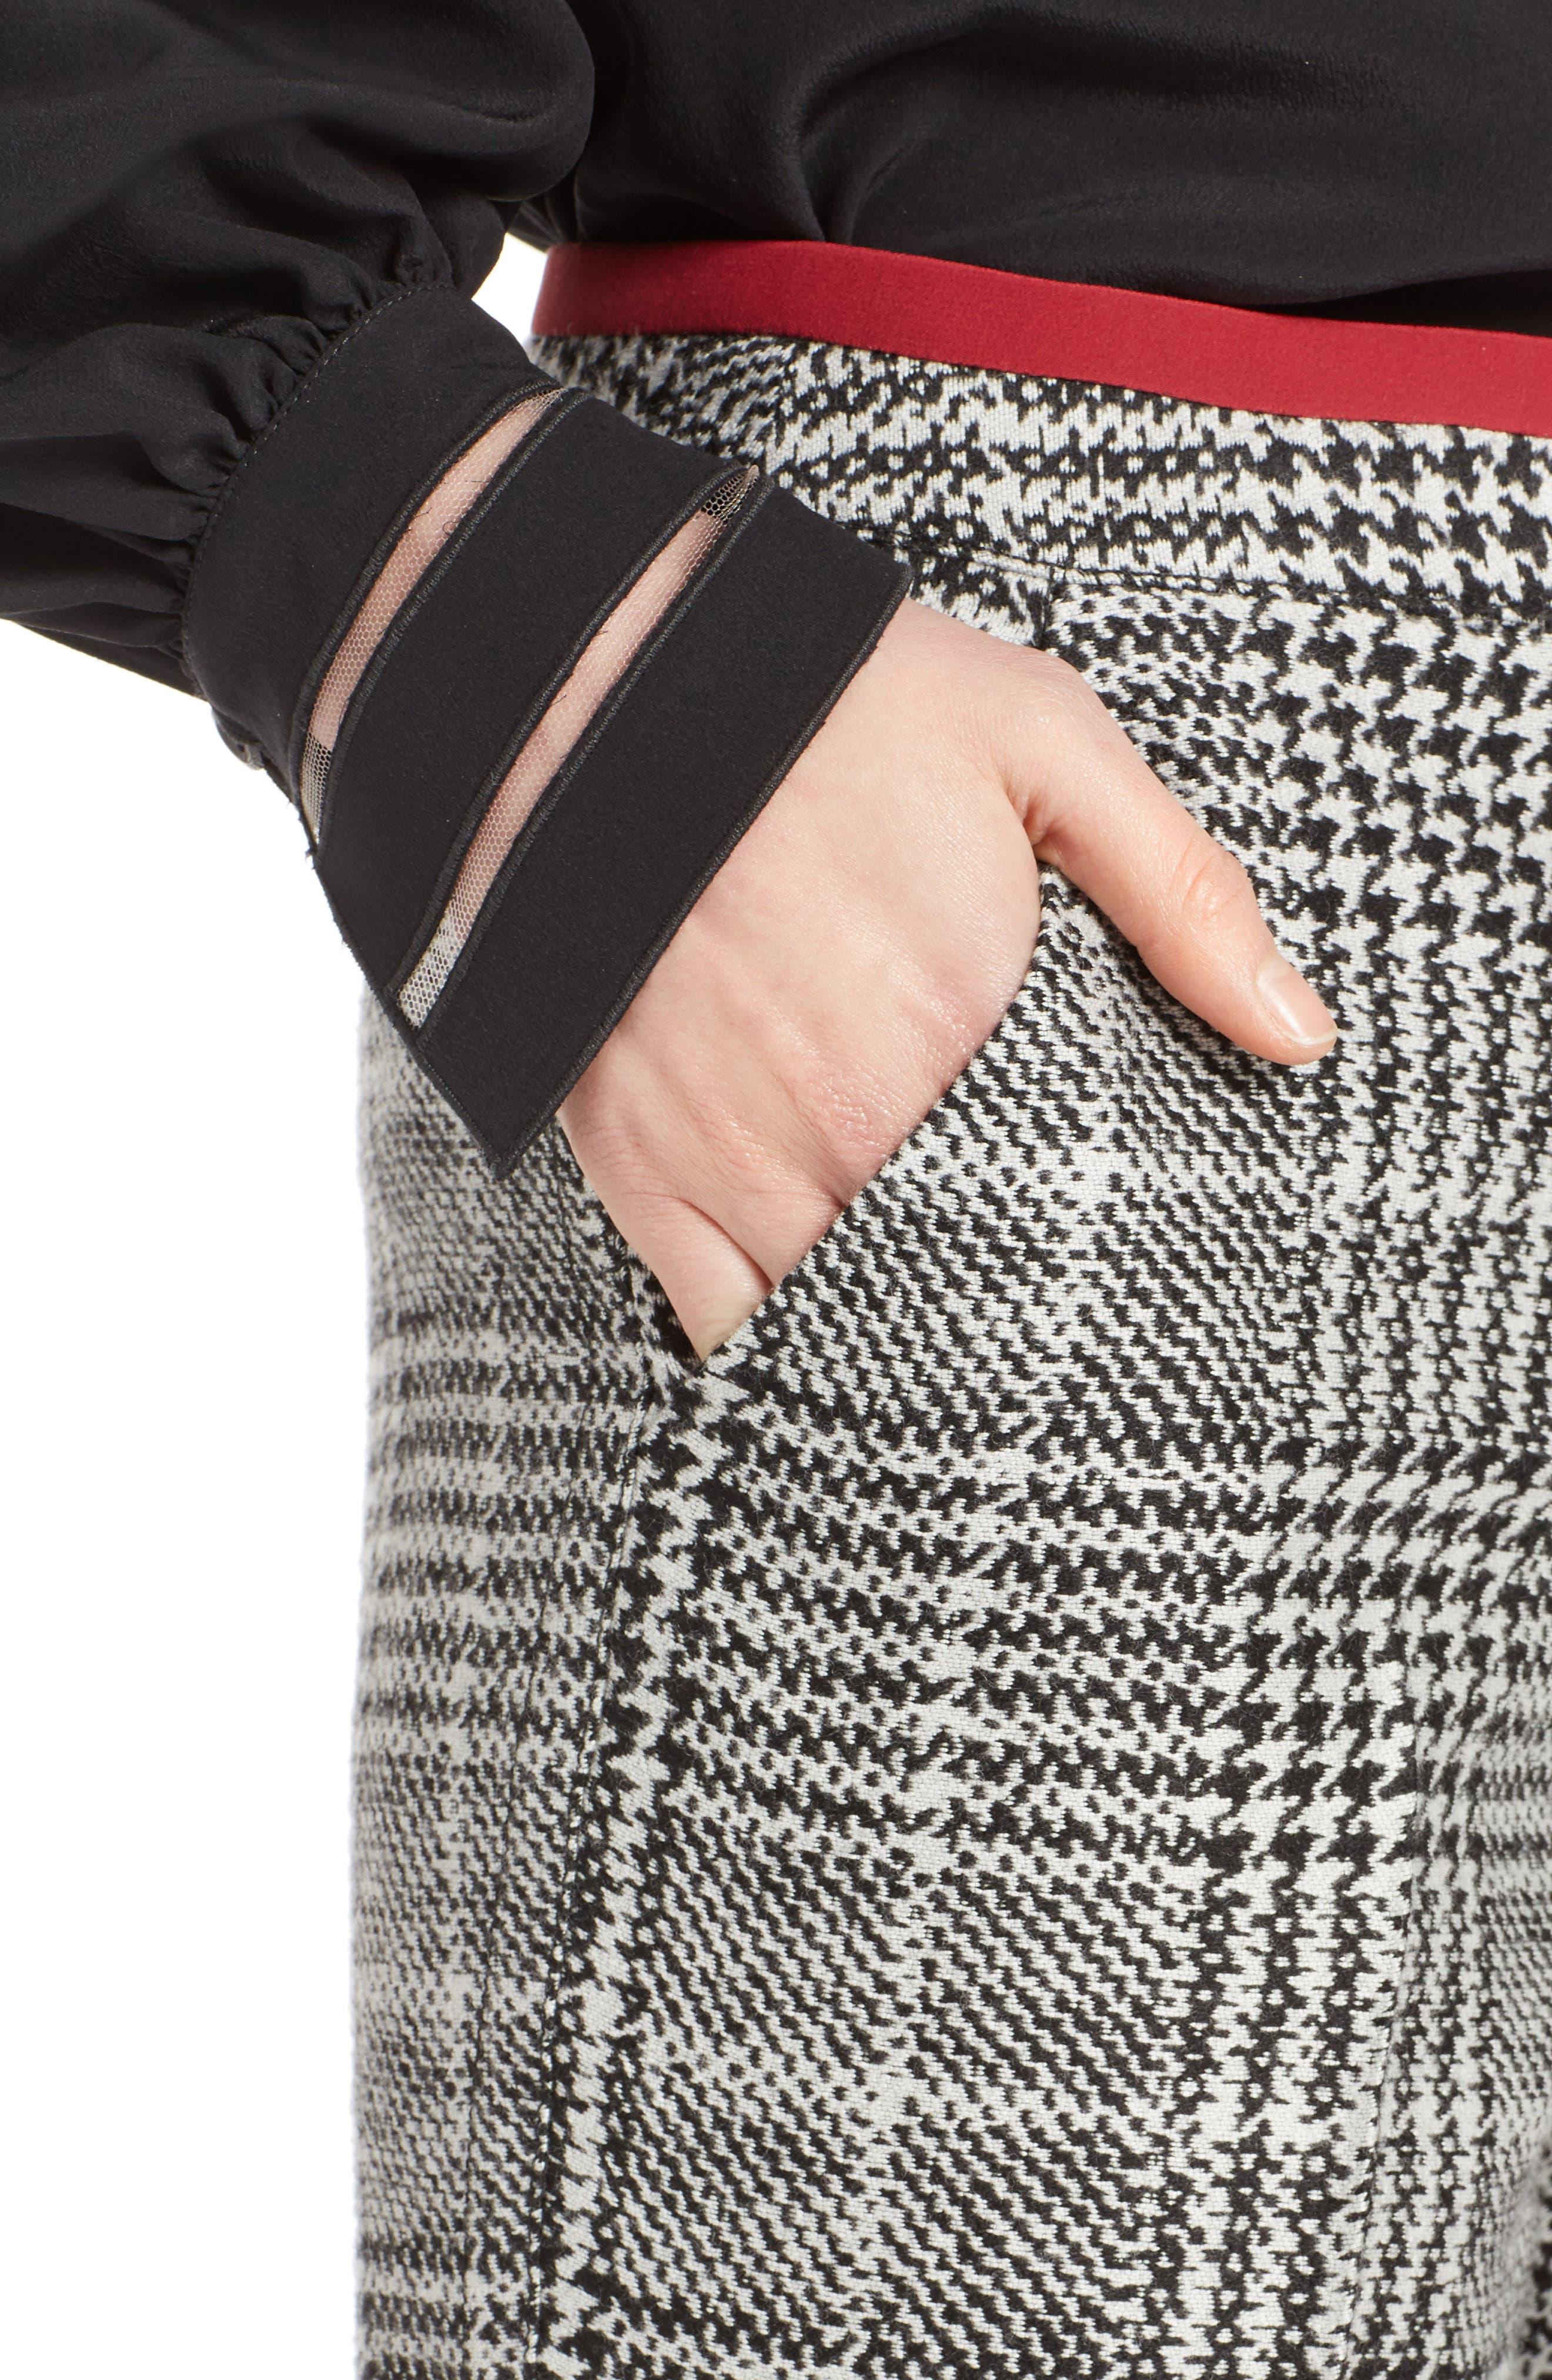 Prince of Wales Print Crop Pants,                             Alternate thumbnail 4, color,                             Black/ White